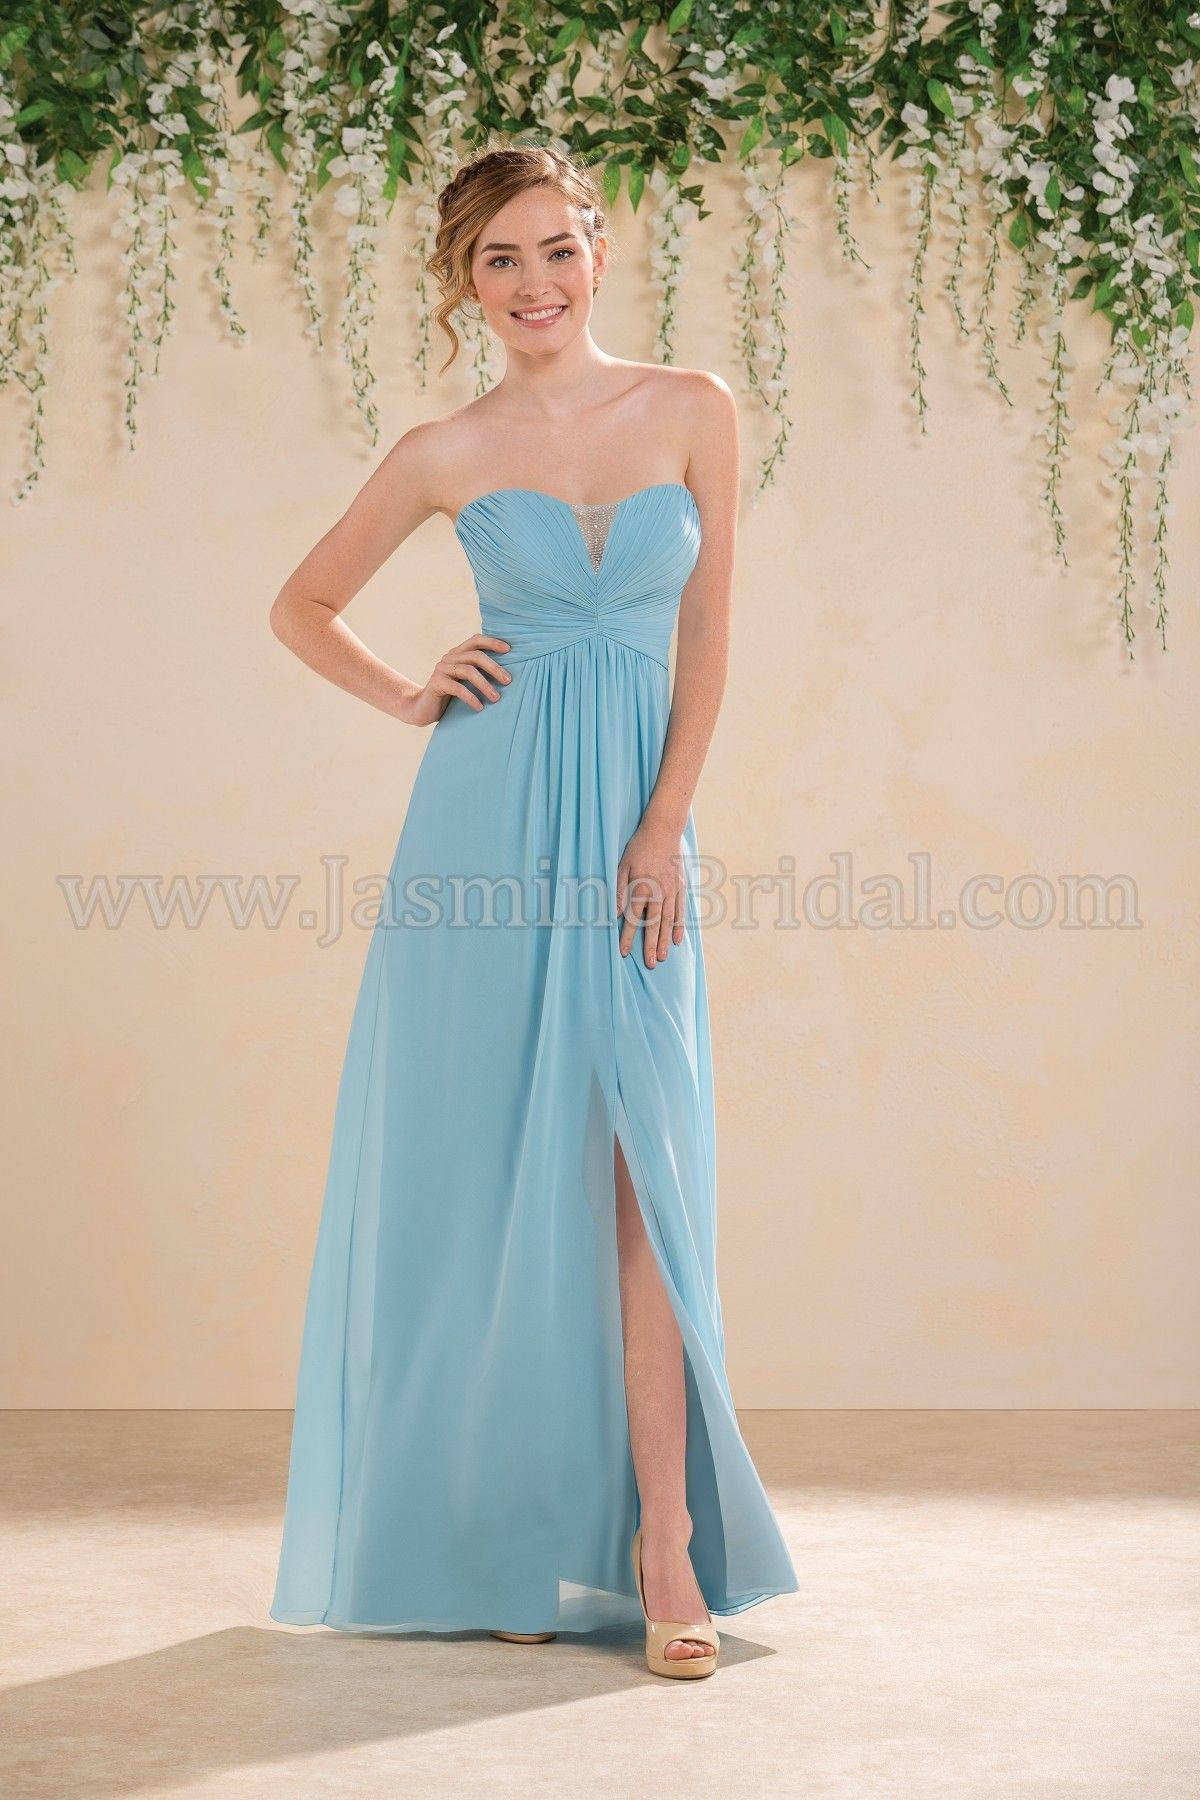 Jasmine bridal bridesmaid dress b2 style b183009 in tahiti blue jasmine bridal bridesmaid dress b2 style b183009 in tahiti blue ombrellifo Images